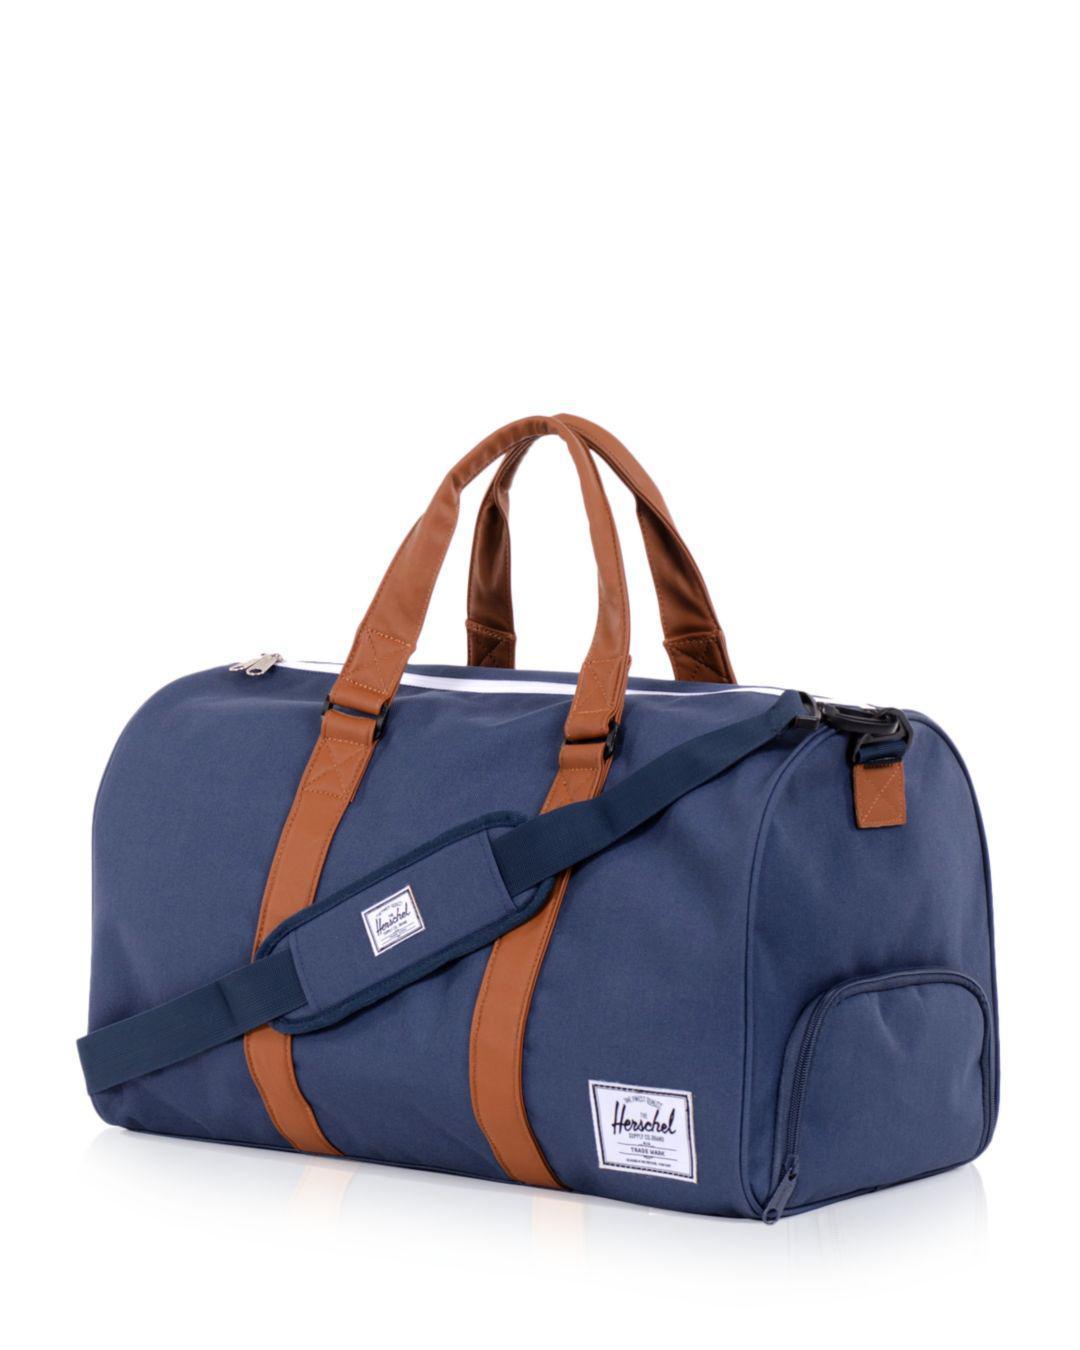 68afedbebe3c Lyst - Herschel Supply Co. Novel Duffel in Blue for Men